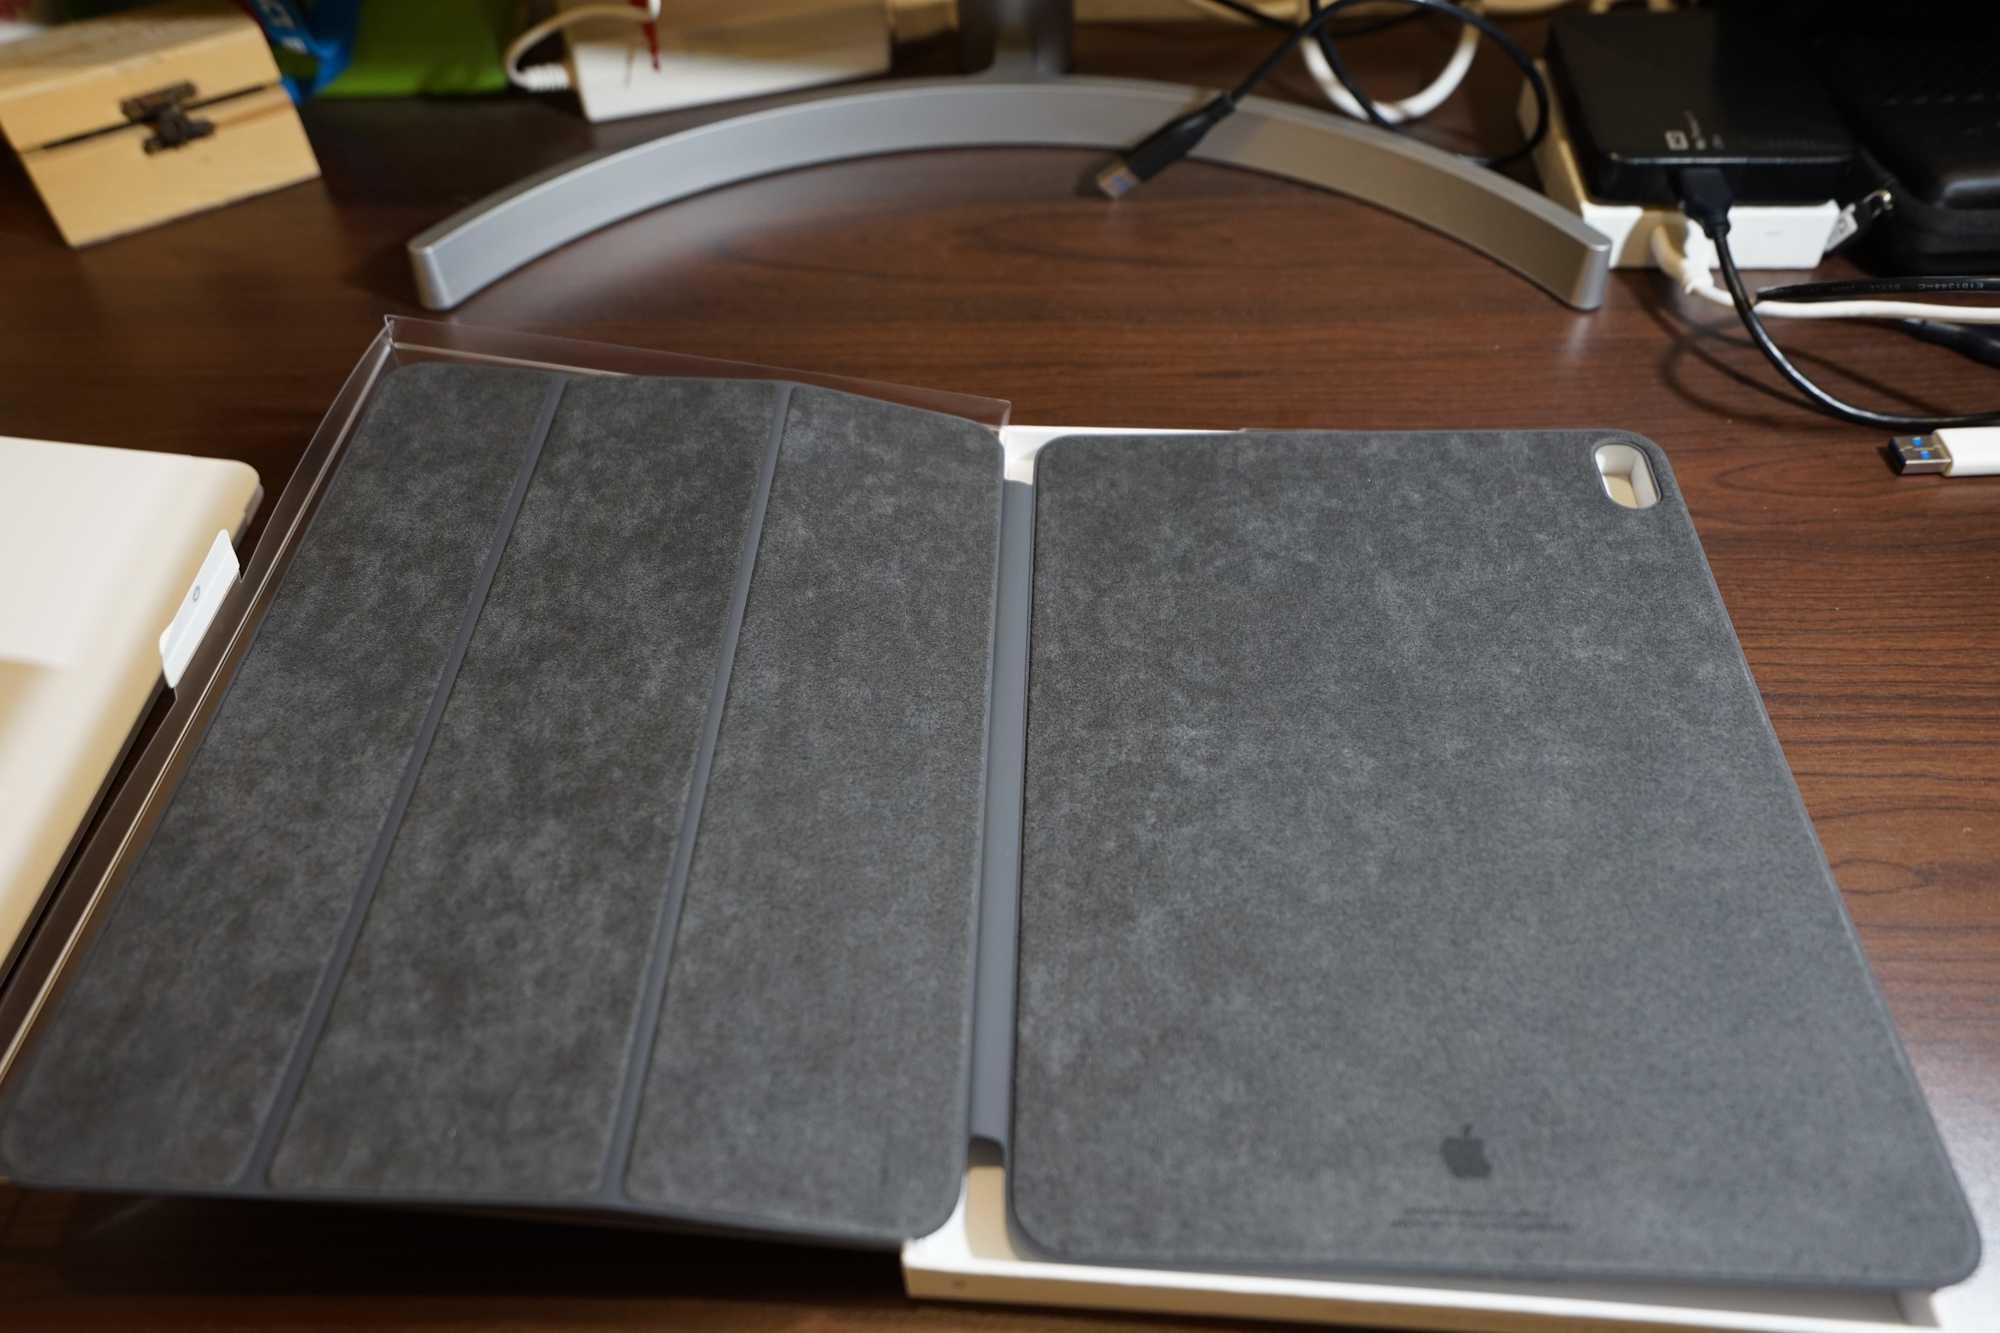 Inside Apple Smart Folio